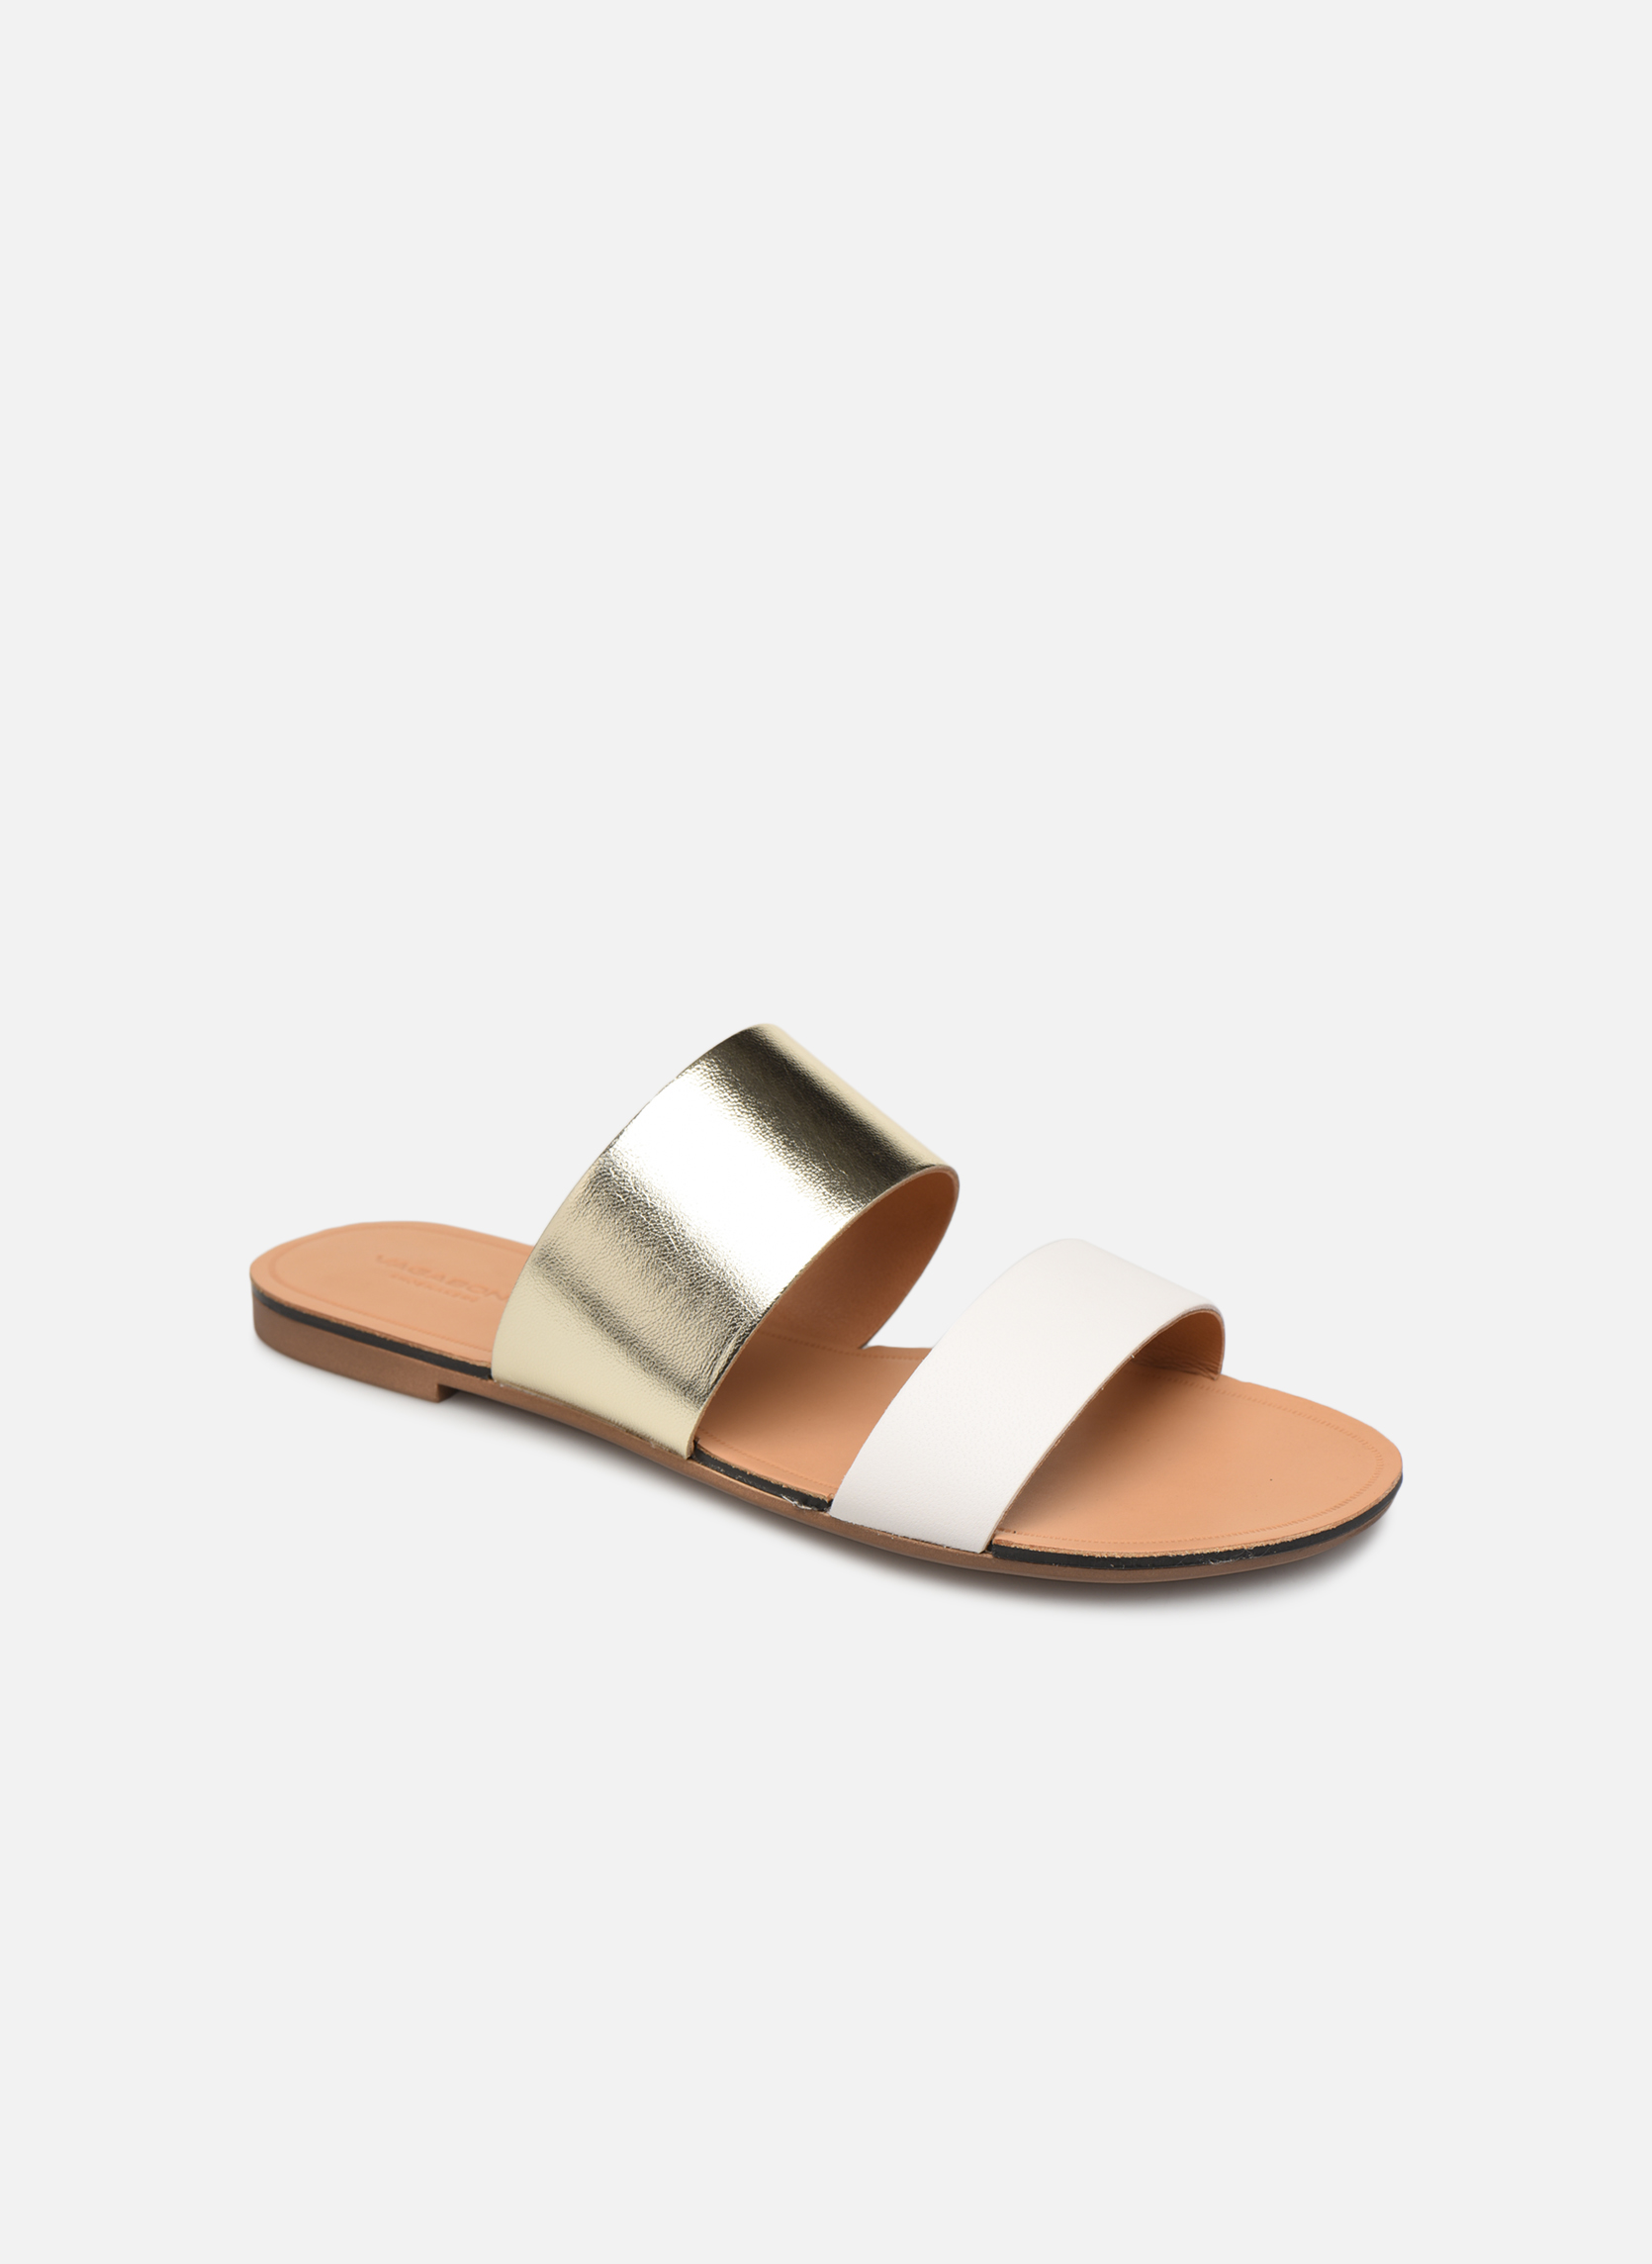 Tia 4731-183 par Vagabond Shoemakers